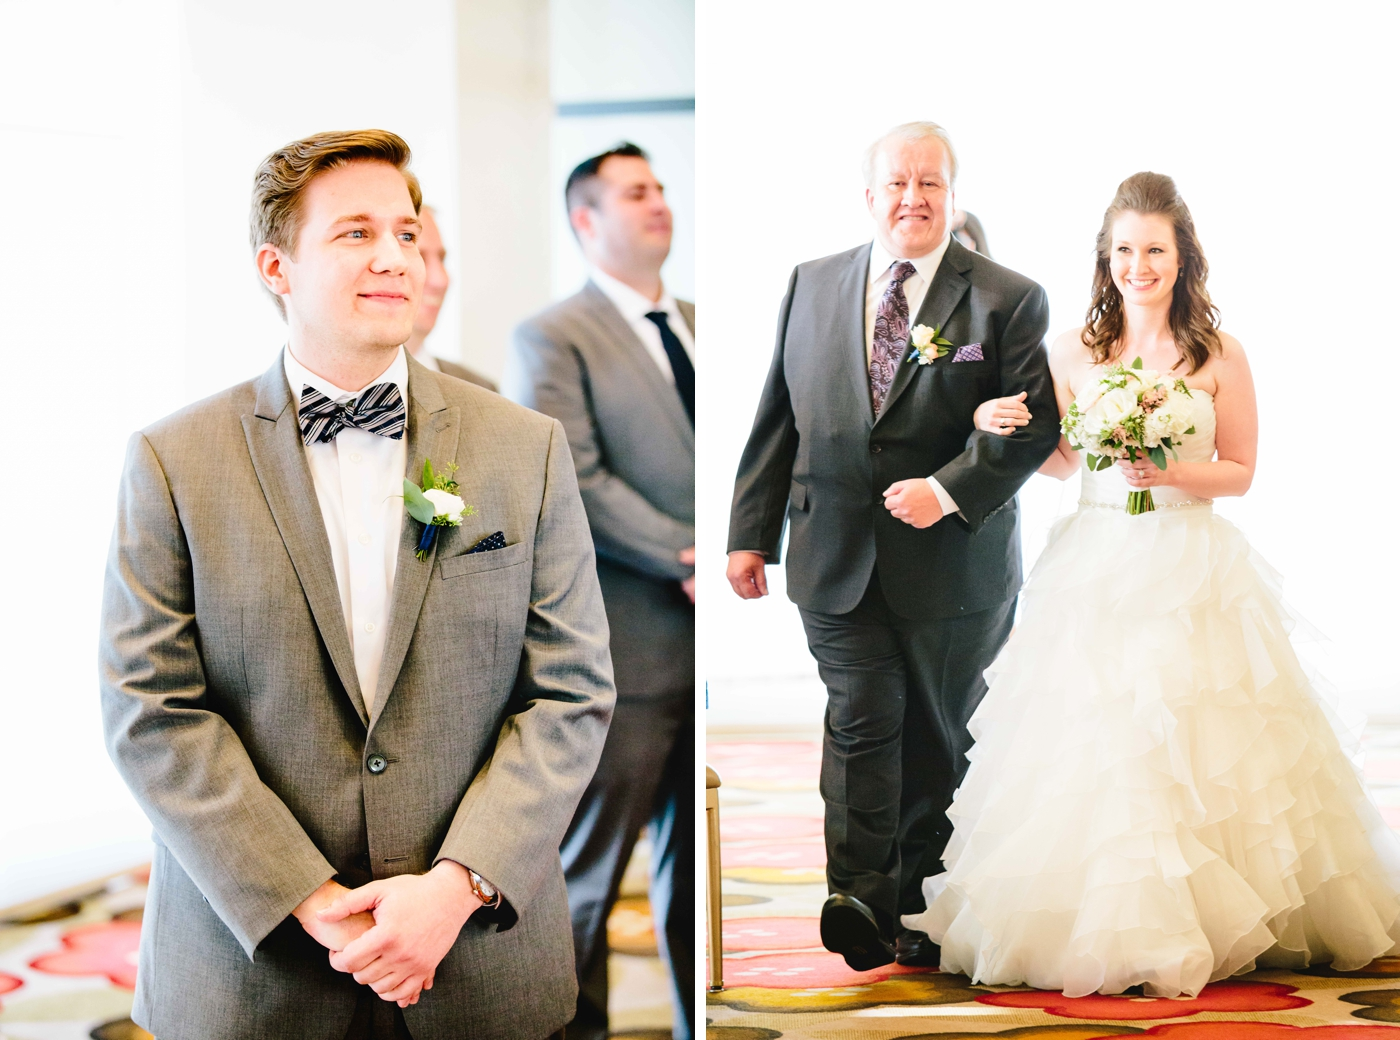 chicago-fine-art-wedding-photography-raz24